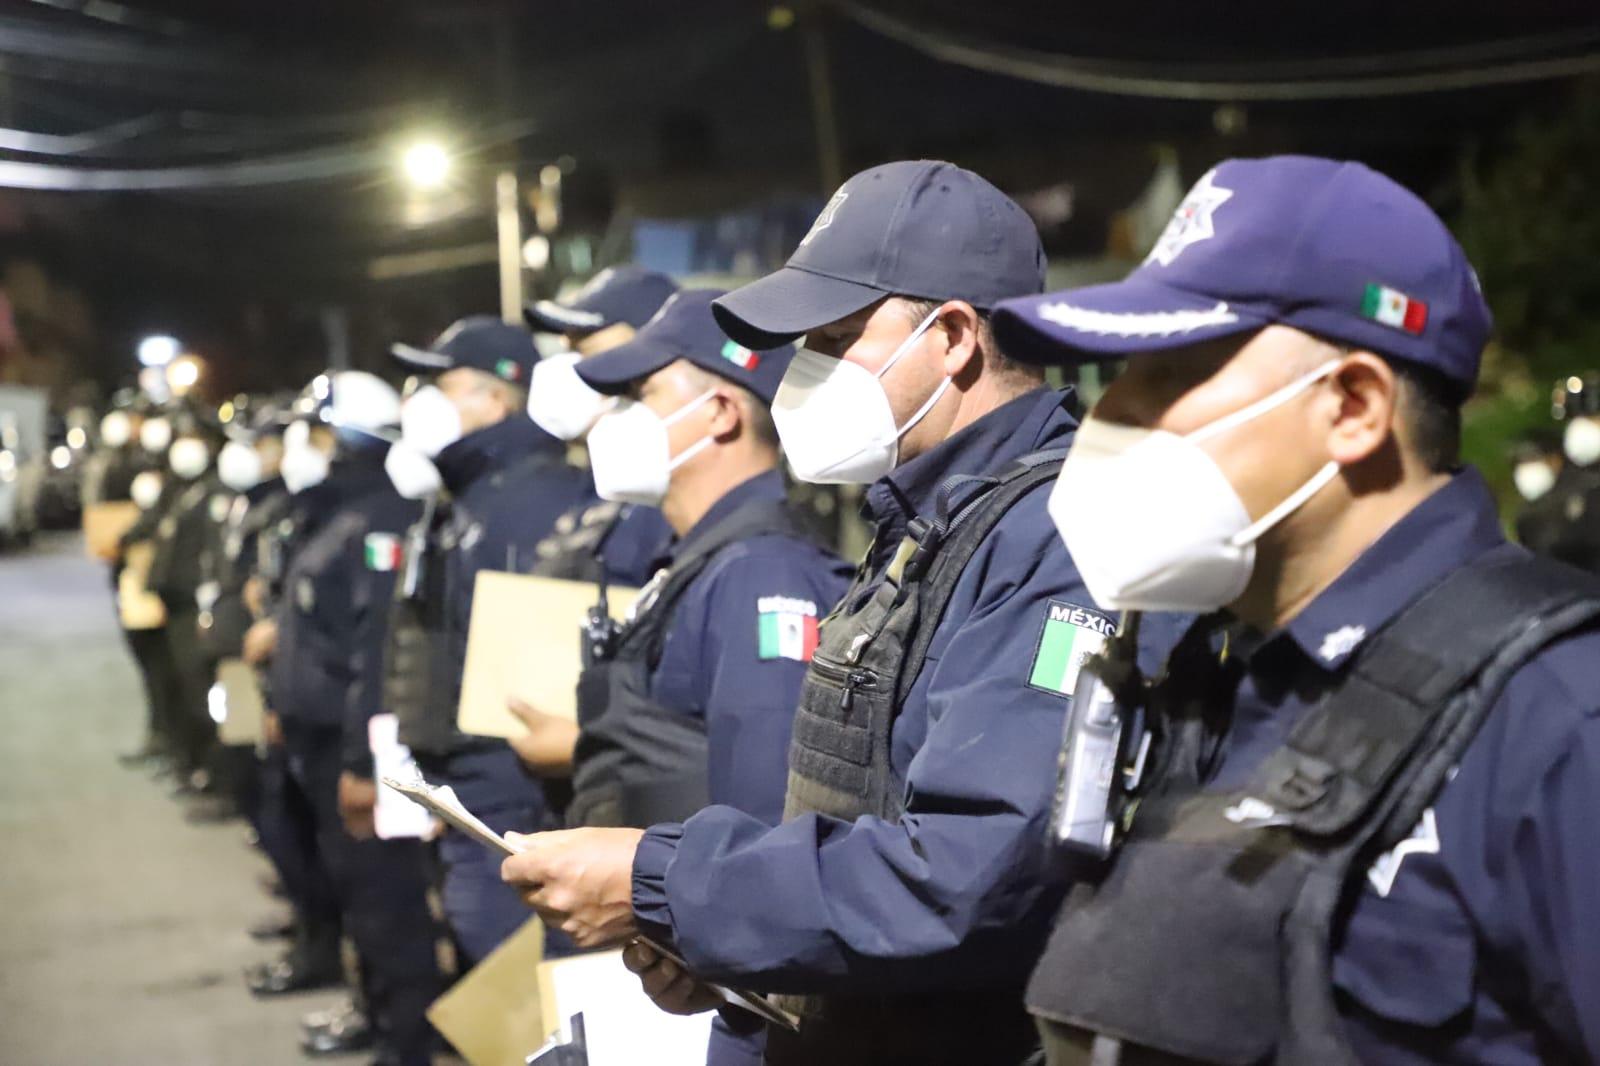 Célula de Búsqueda de Ecatepec localiza a 316 personas este año con modelo de reacción inmediata